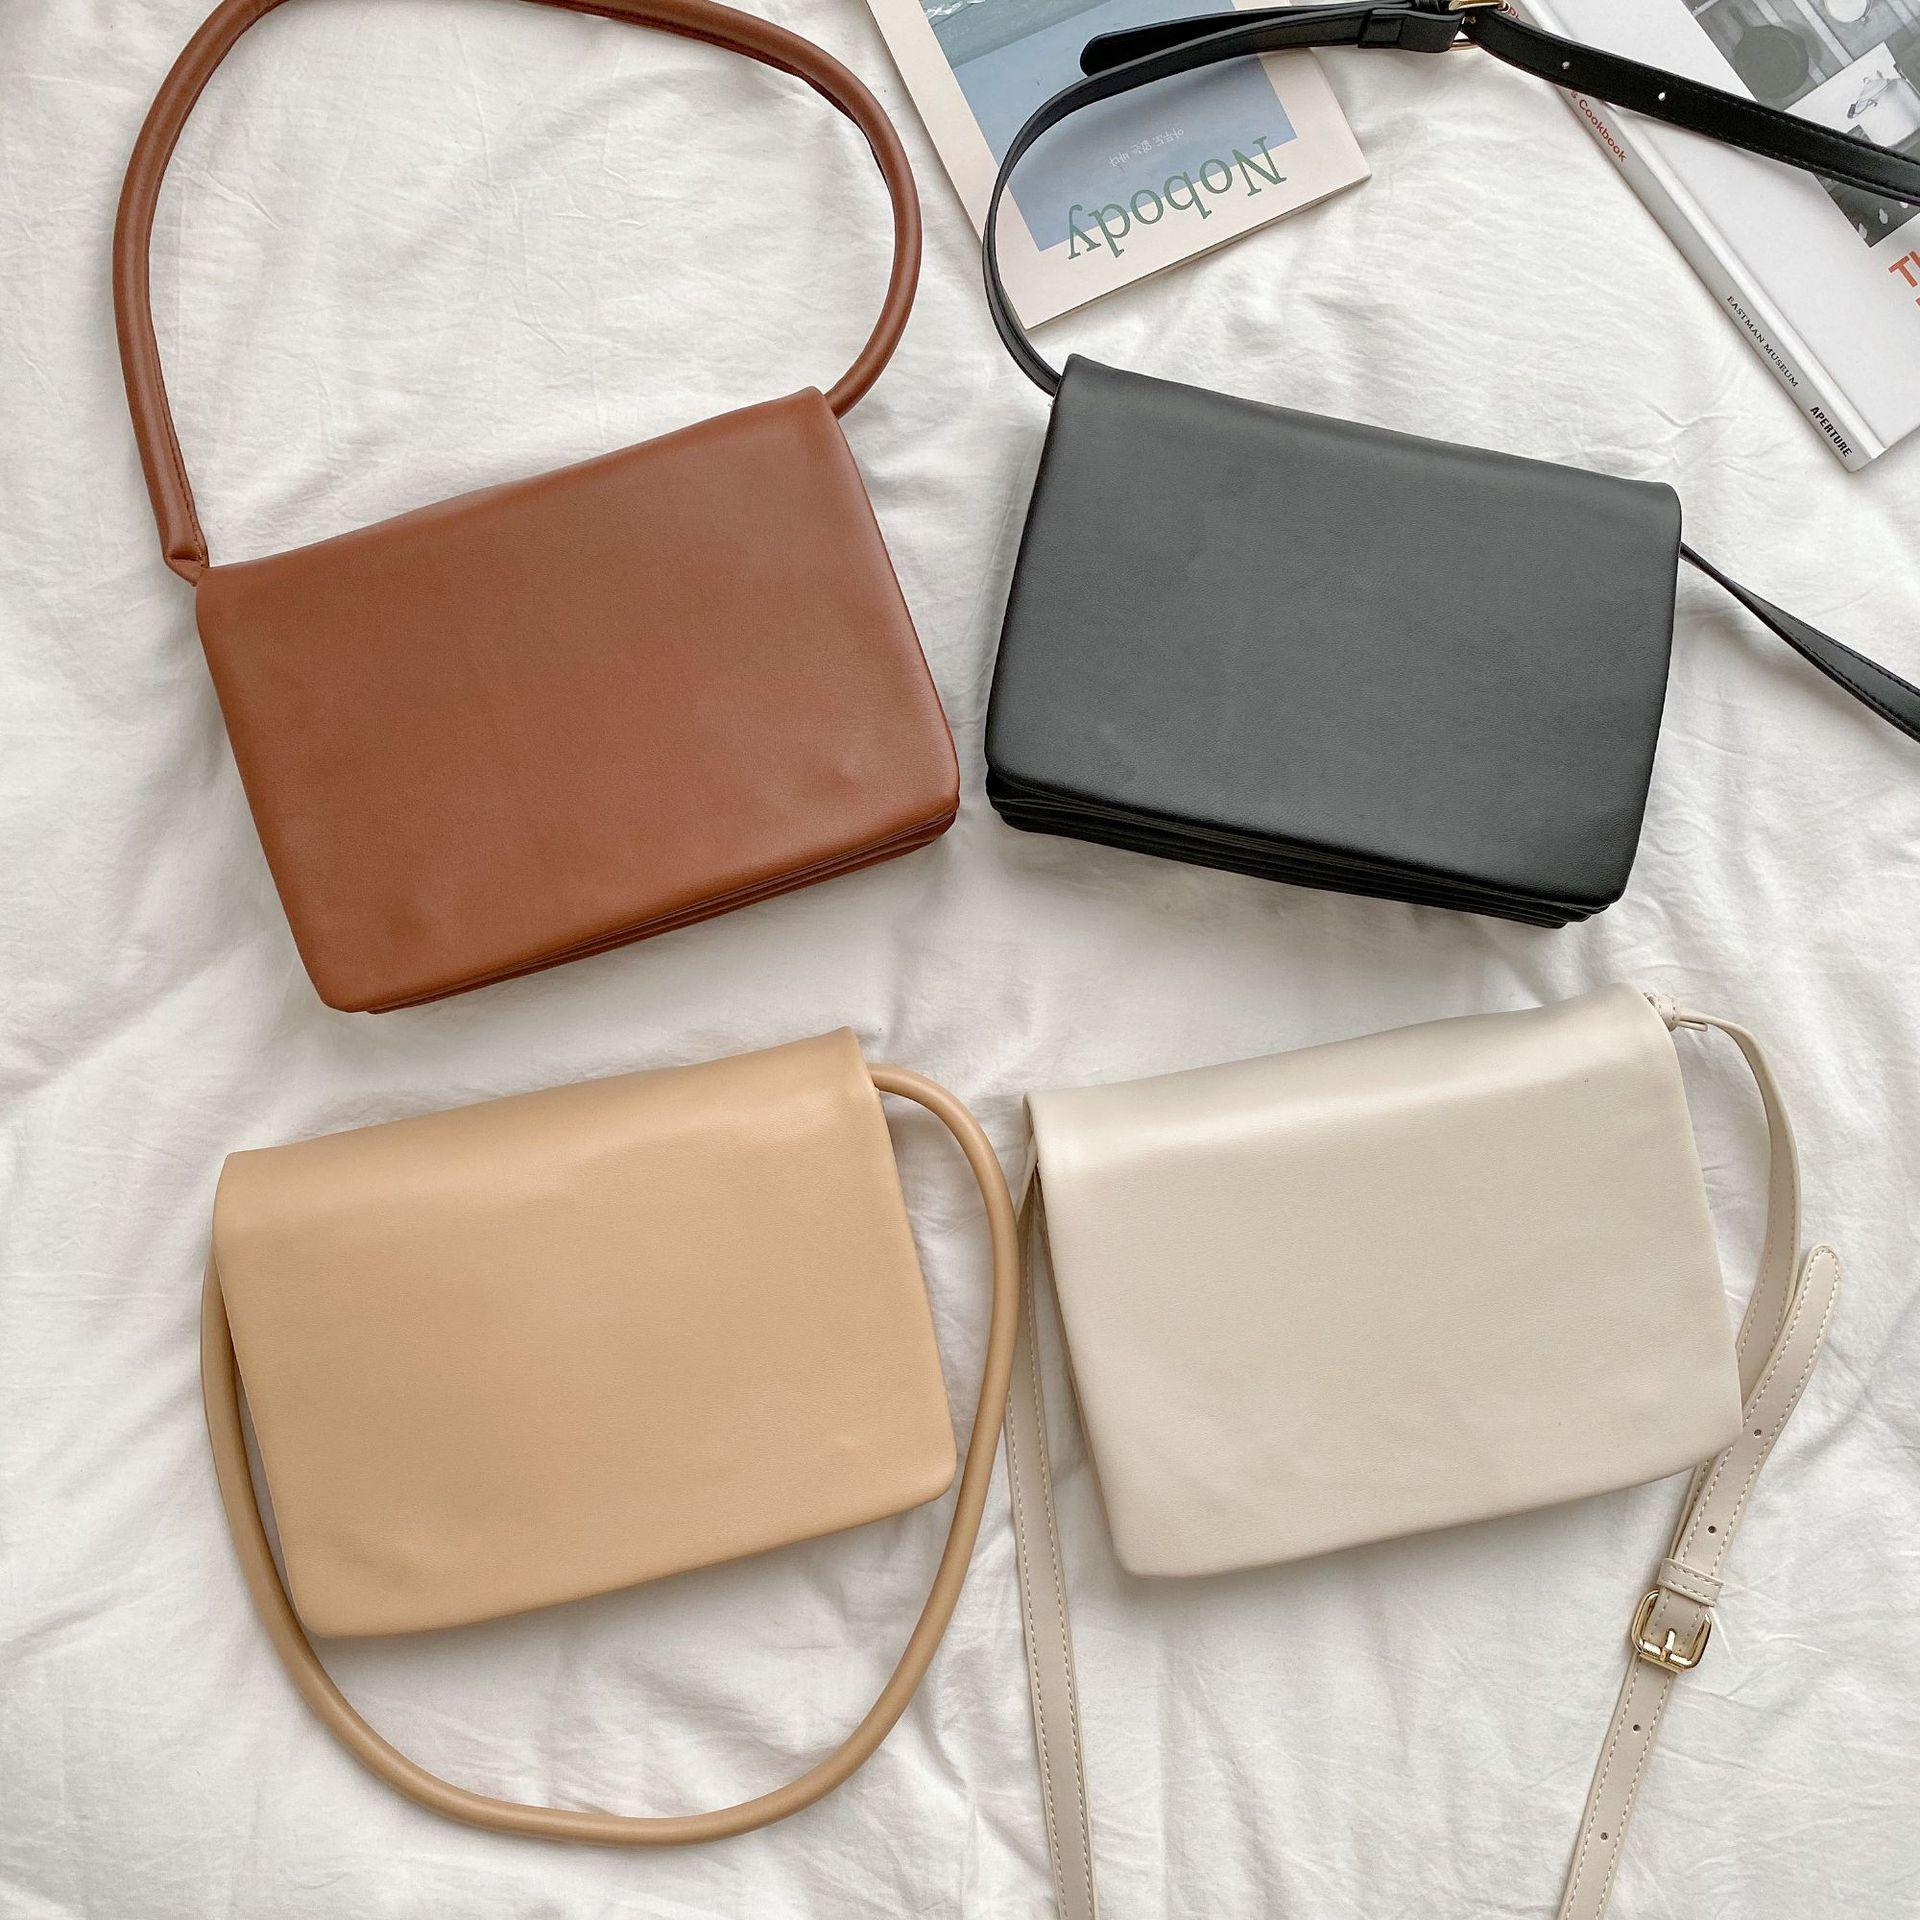 HBP Bag women's bag Korean version of the new fashion underarm bag ladies shoulder Messenger